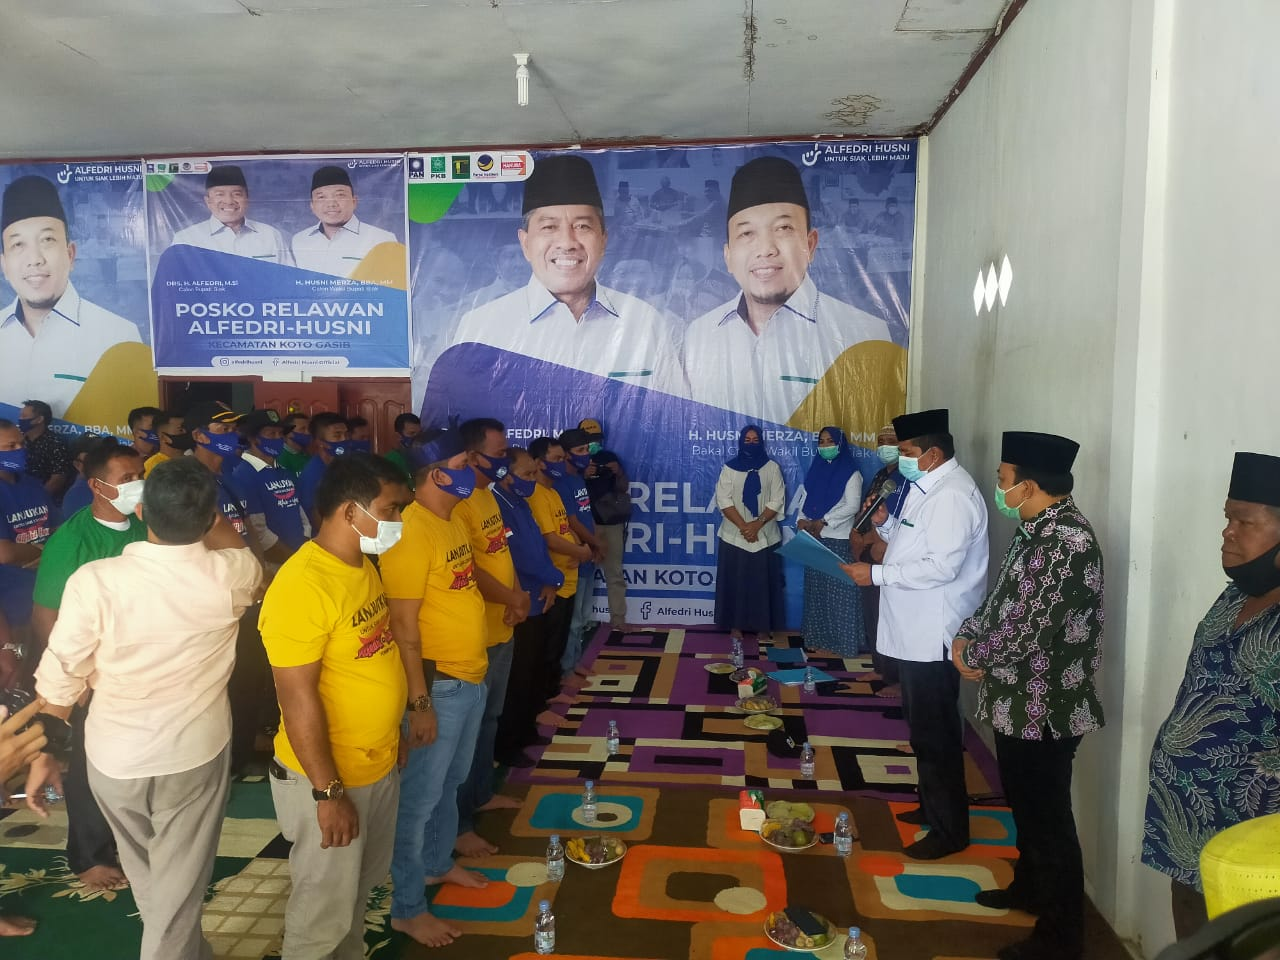 Alfedri-Husni Kukuhan Tim Relawan Kecamatan Koto Gasib